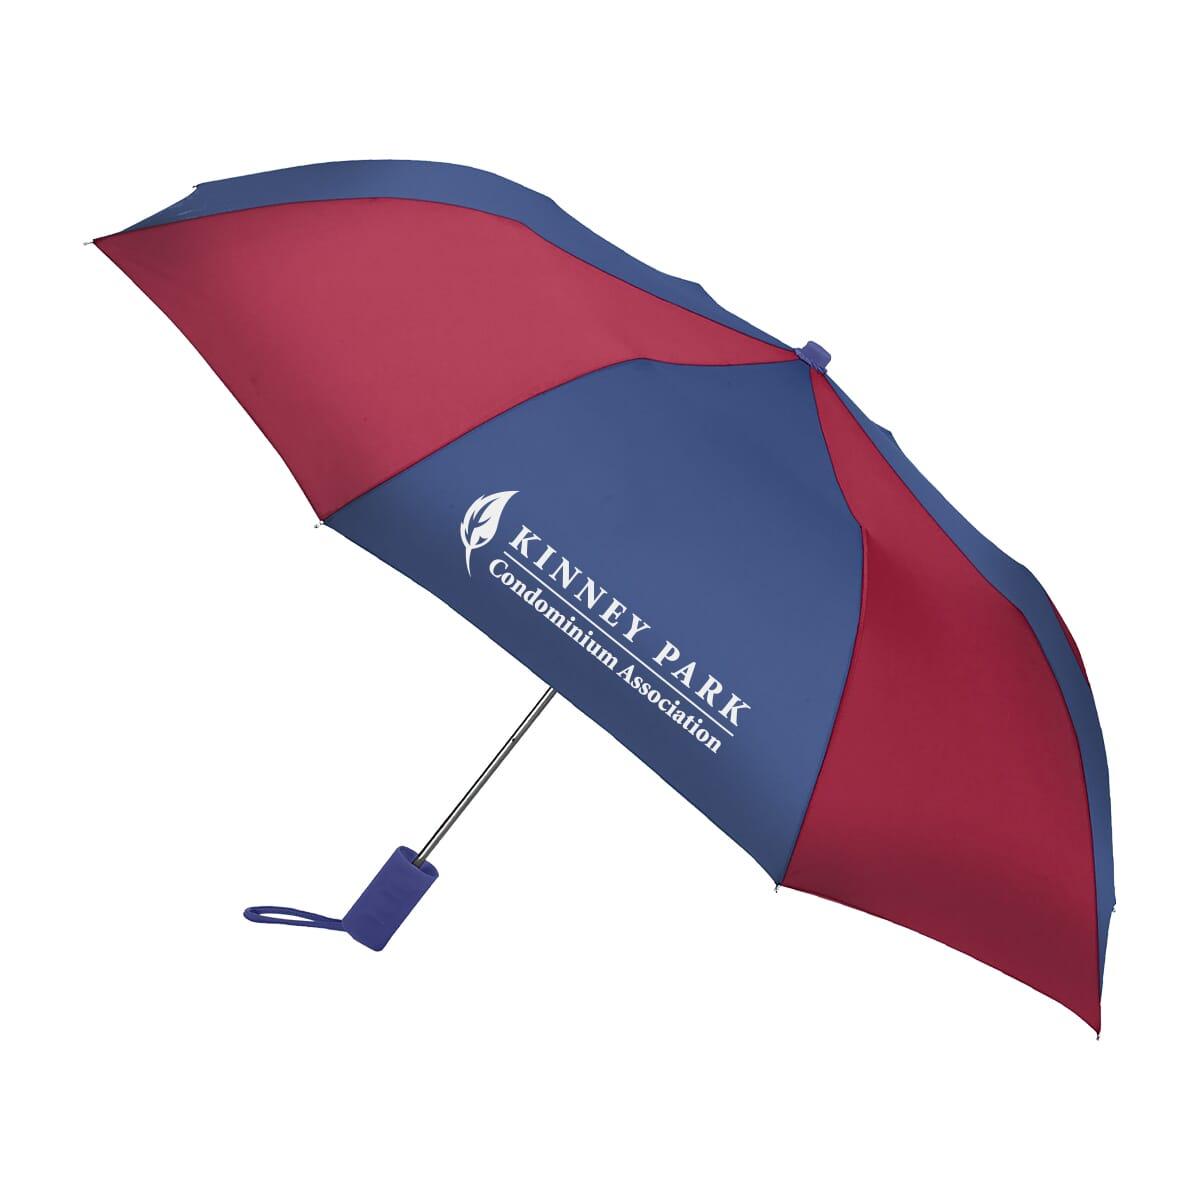 Striped umbrella with logo